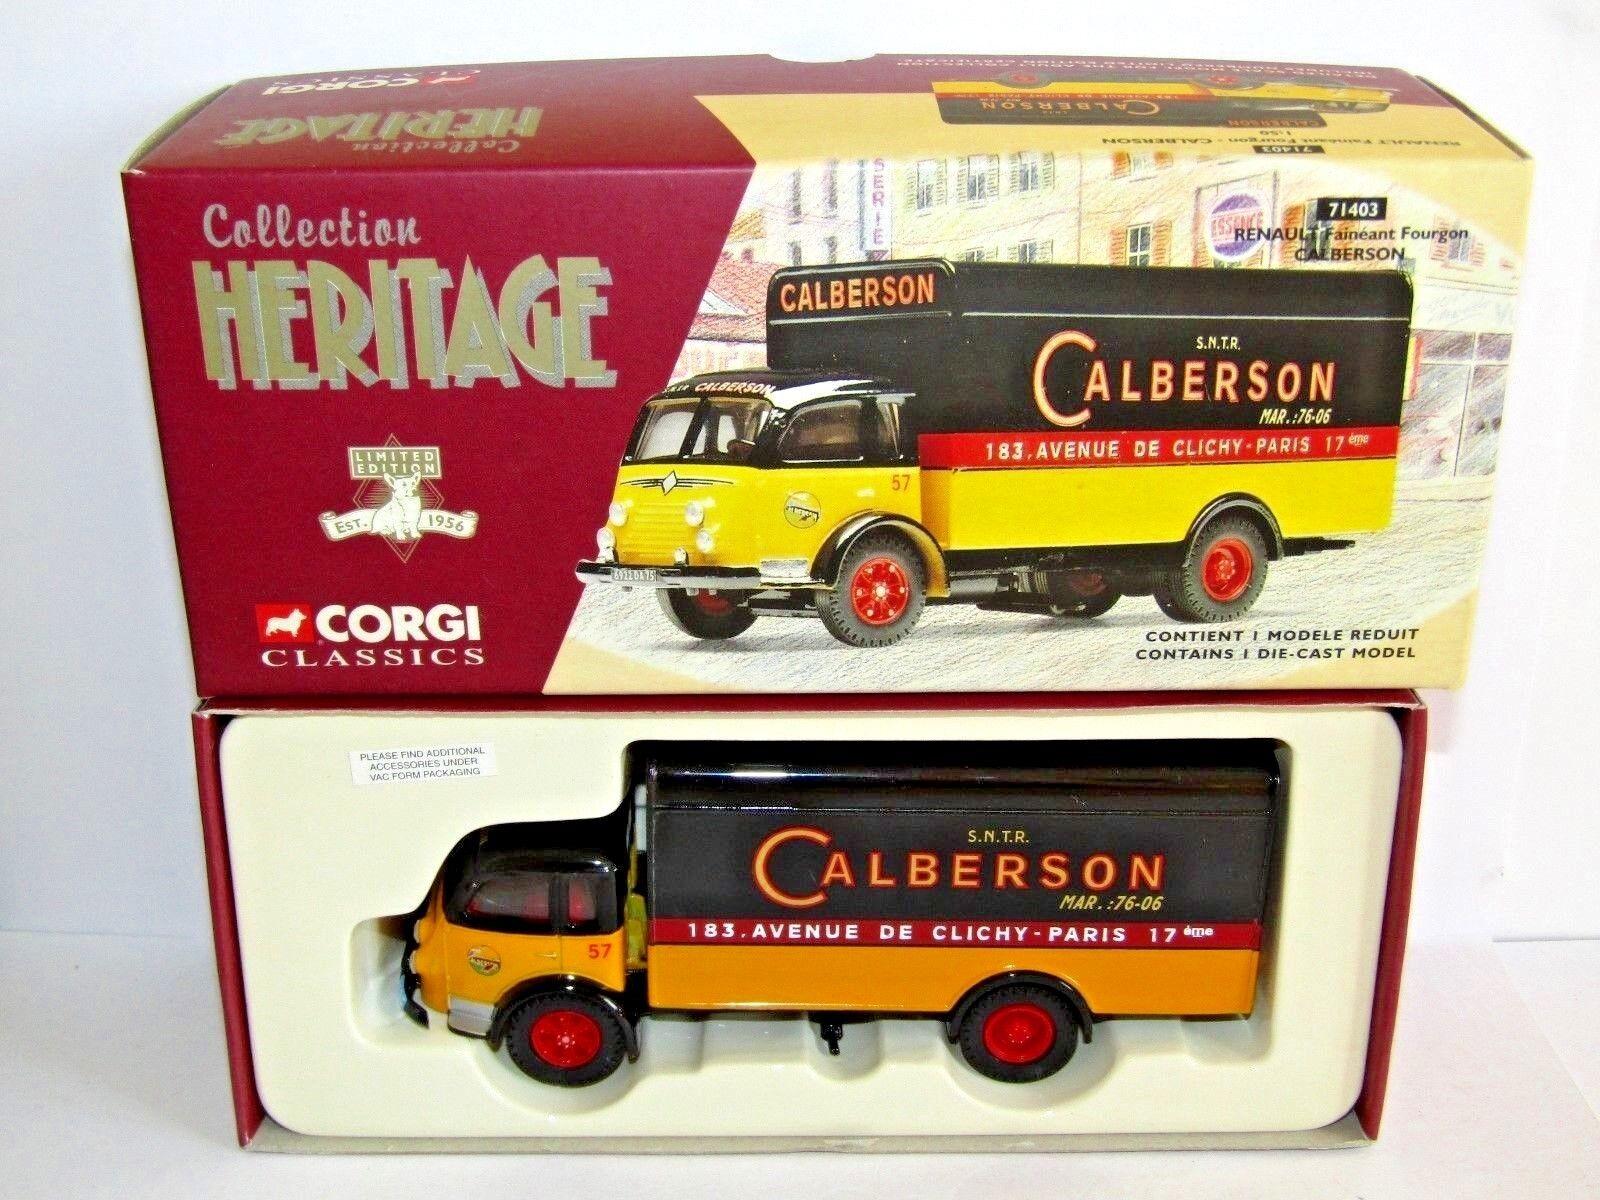 CORGI RENAULT FAINEANT FOURGON CALBERSON 1 50 71403